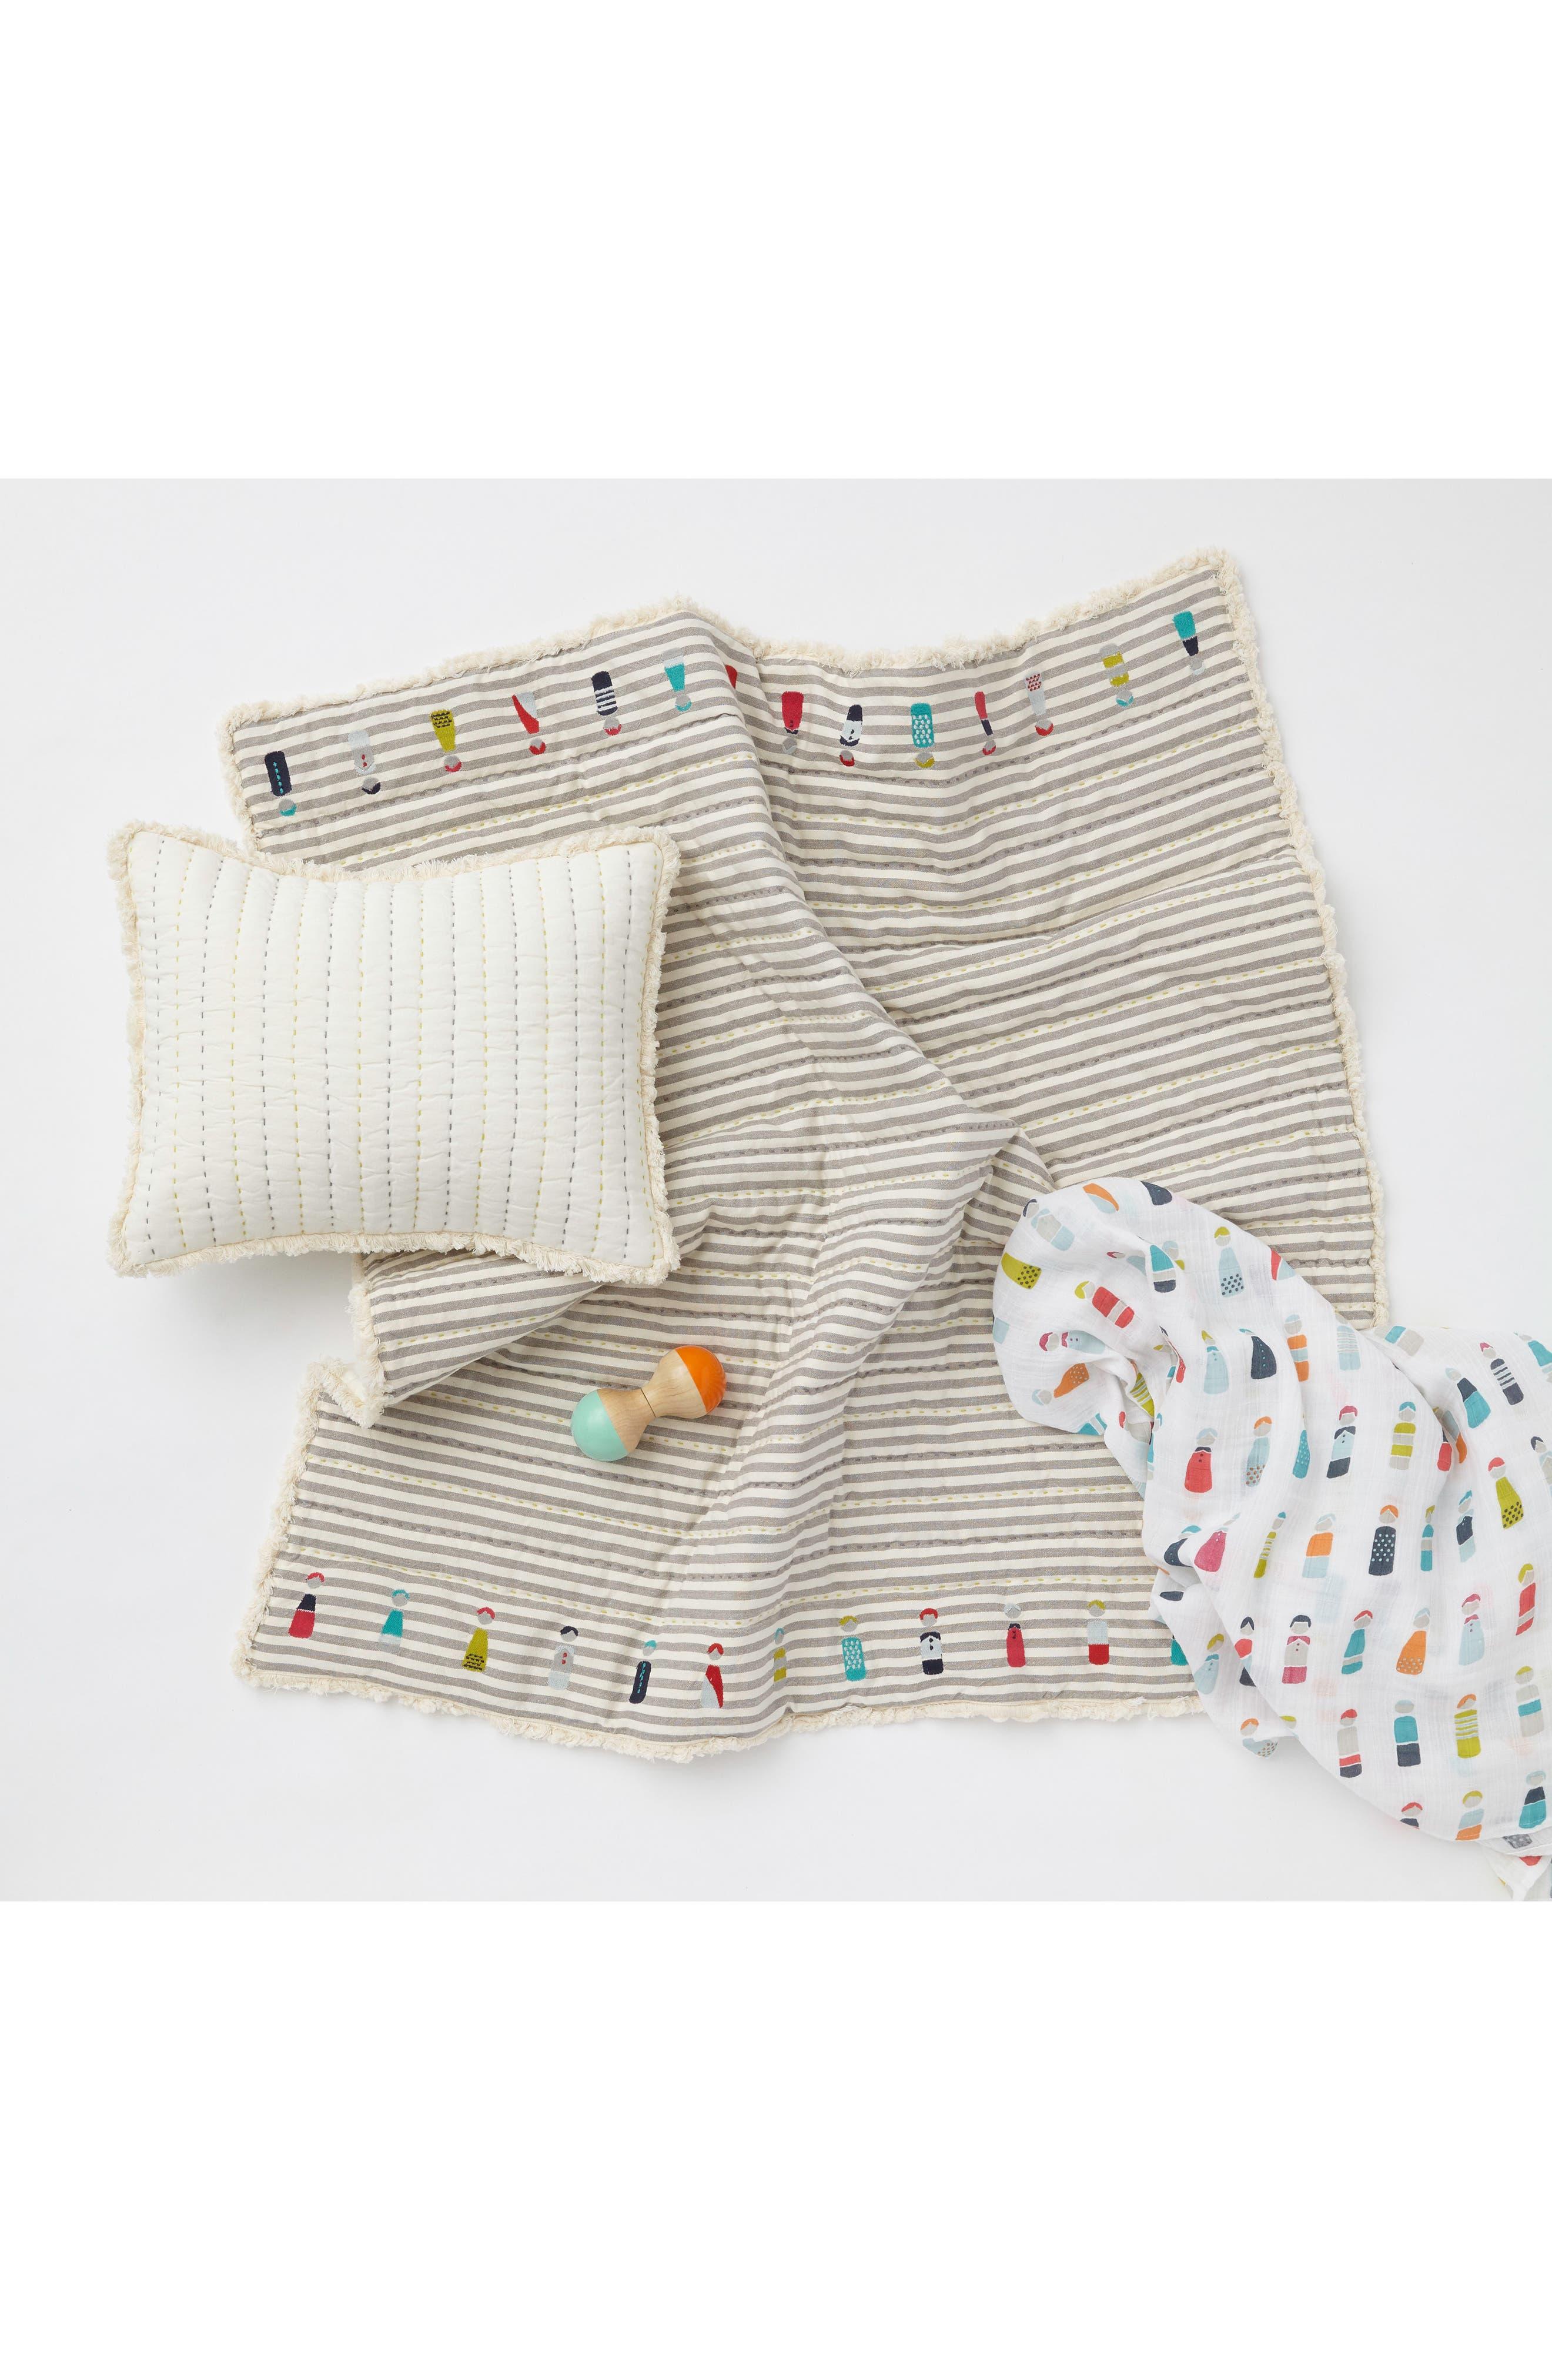 Little Peeps Play Blanket,                             Alternate thumbnail 3, color,                             GREY